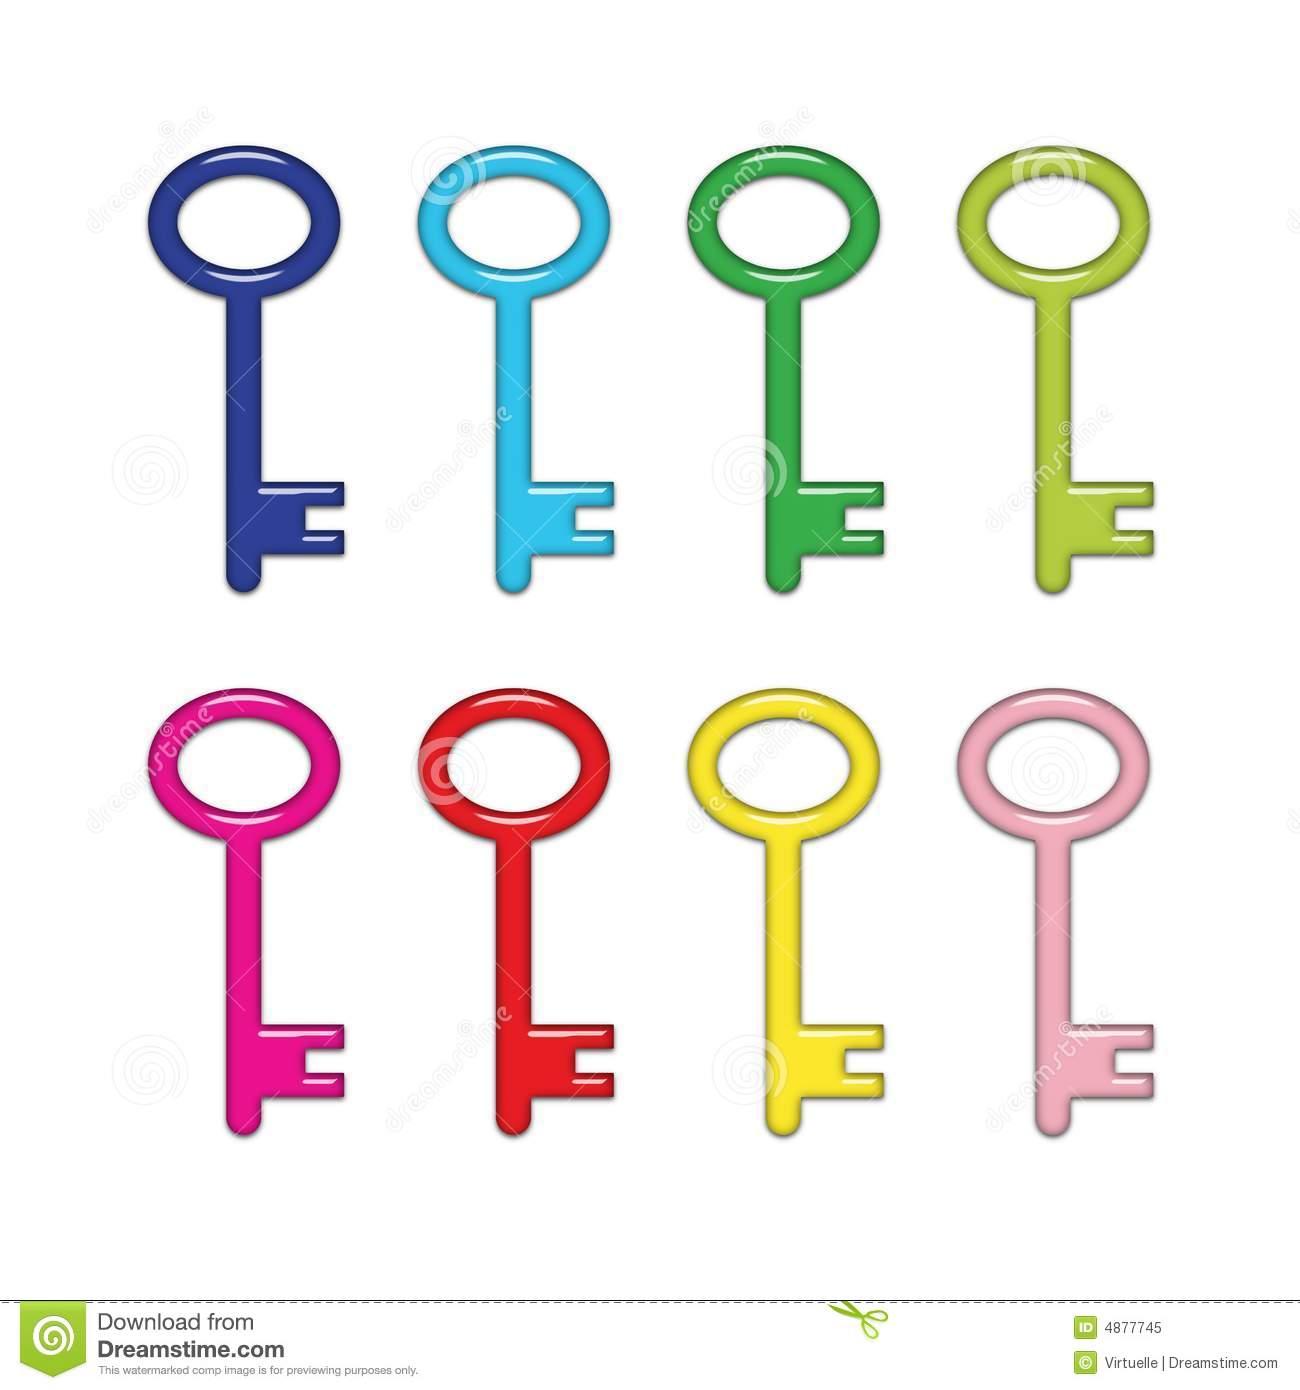 Key clipart colored key (28+) logo blue yellow ·